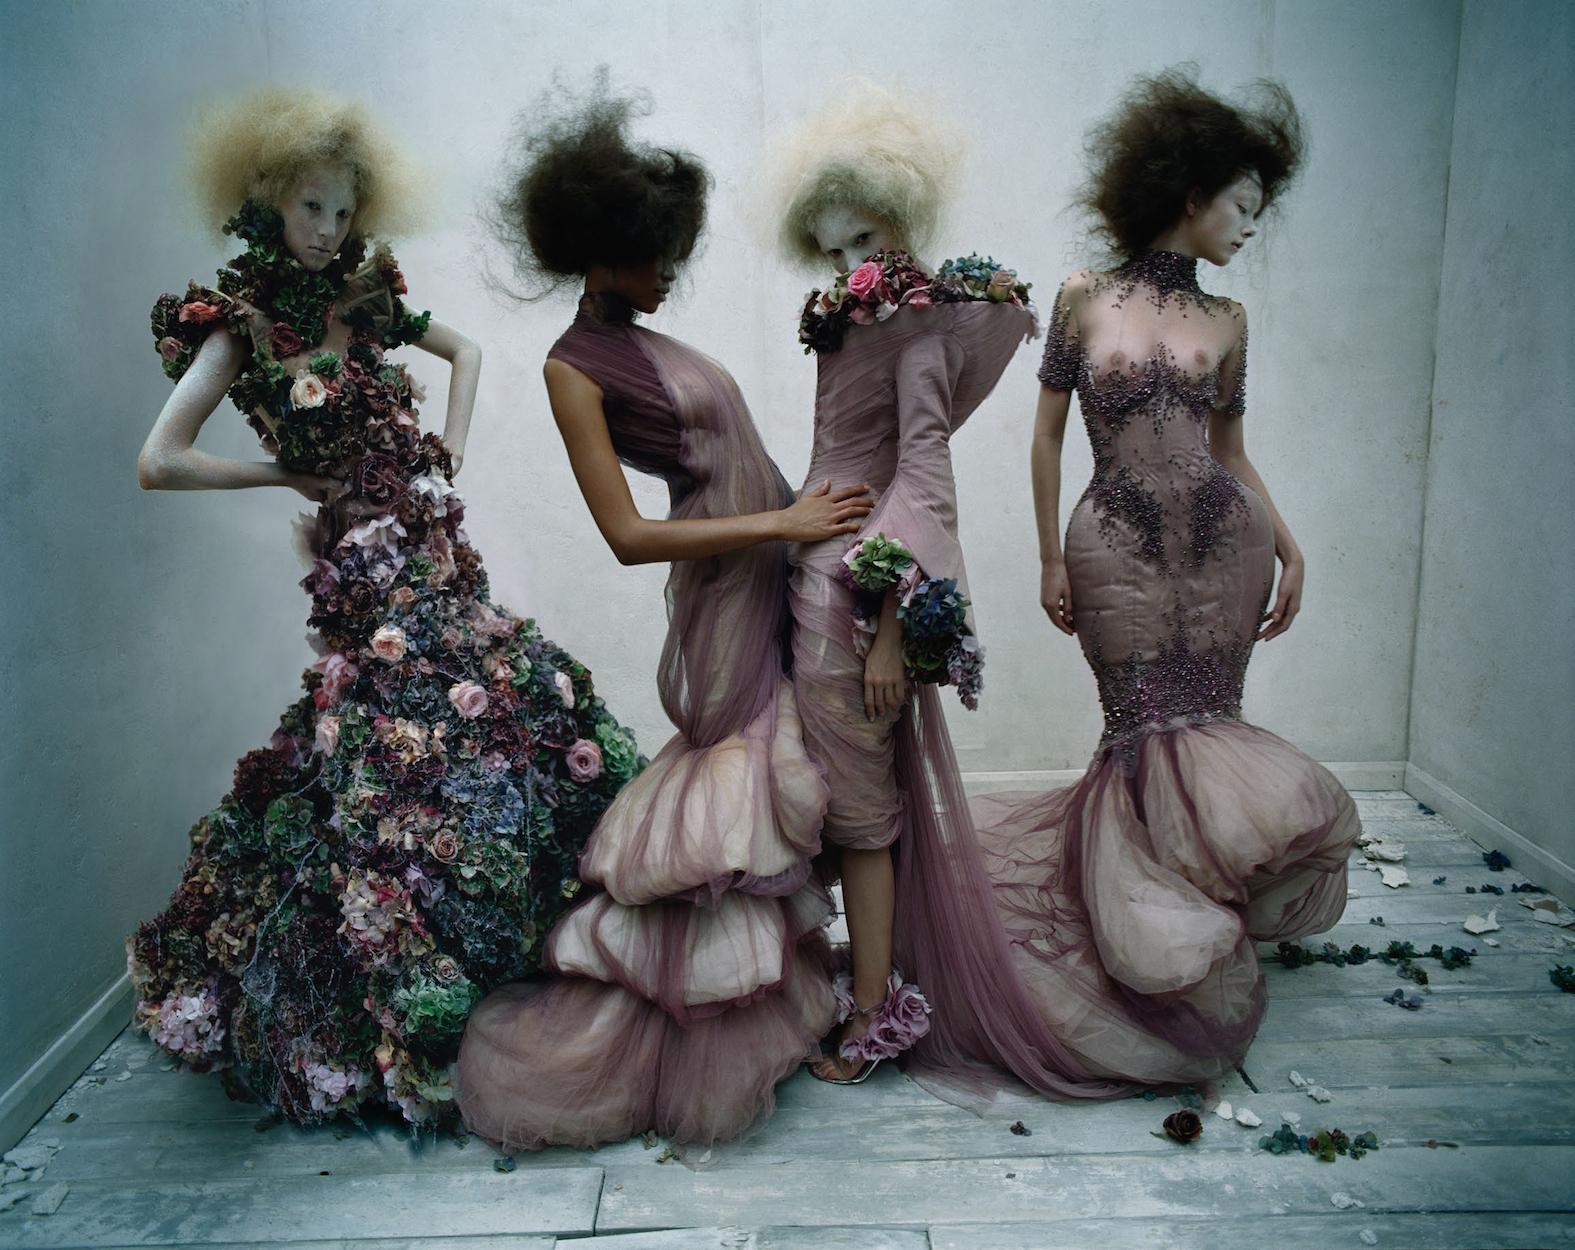 Dark Angel:McQueen Feature Models- Aya Jonaes, Xiao Wen Ju, Harleth Kuusik, Yumi Lambert & Nastya Sten Photographer- Tim Walker Stylist- Kate Phelan04